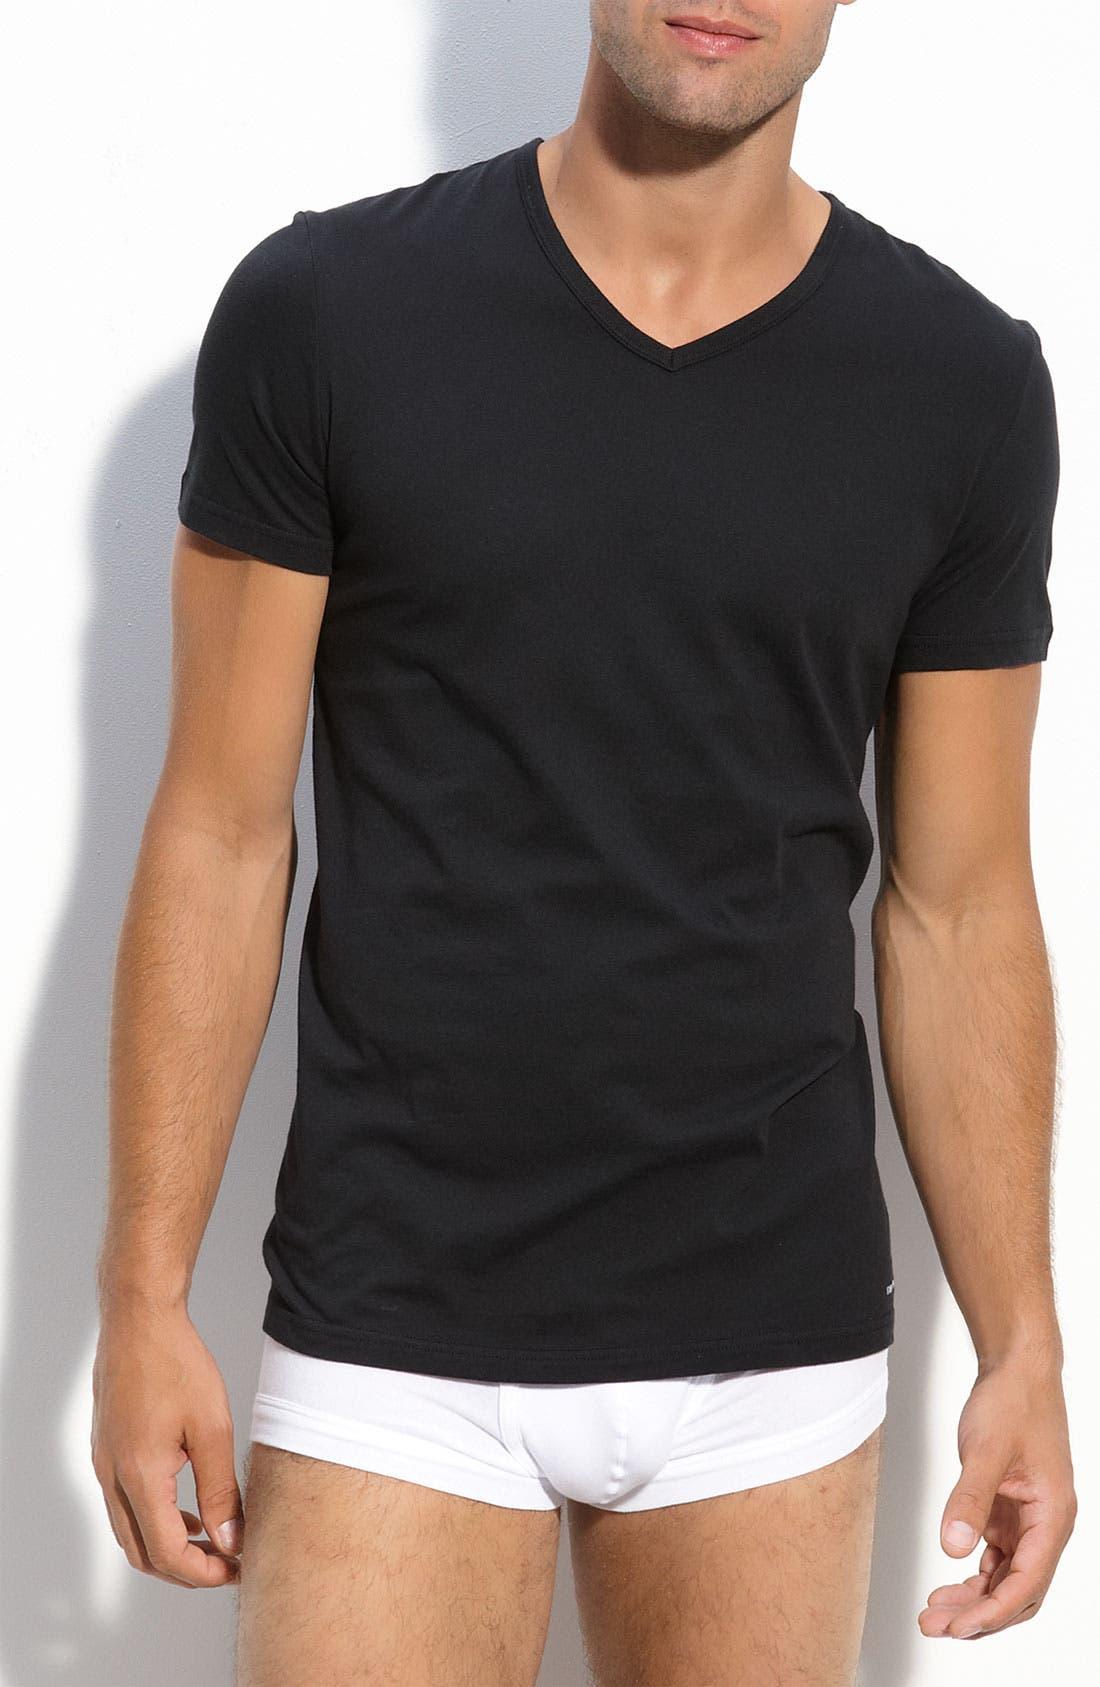 Alternate Image 1 Selected - Emporio Armani V-Neck T-Shirt (3-Pack)